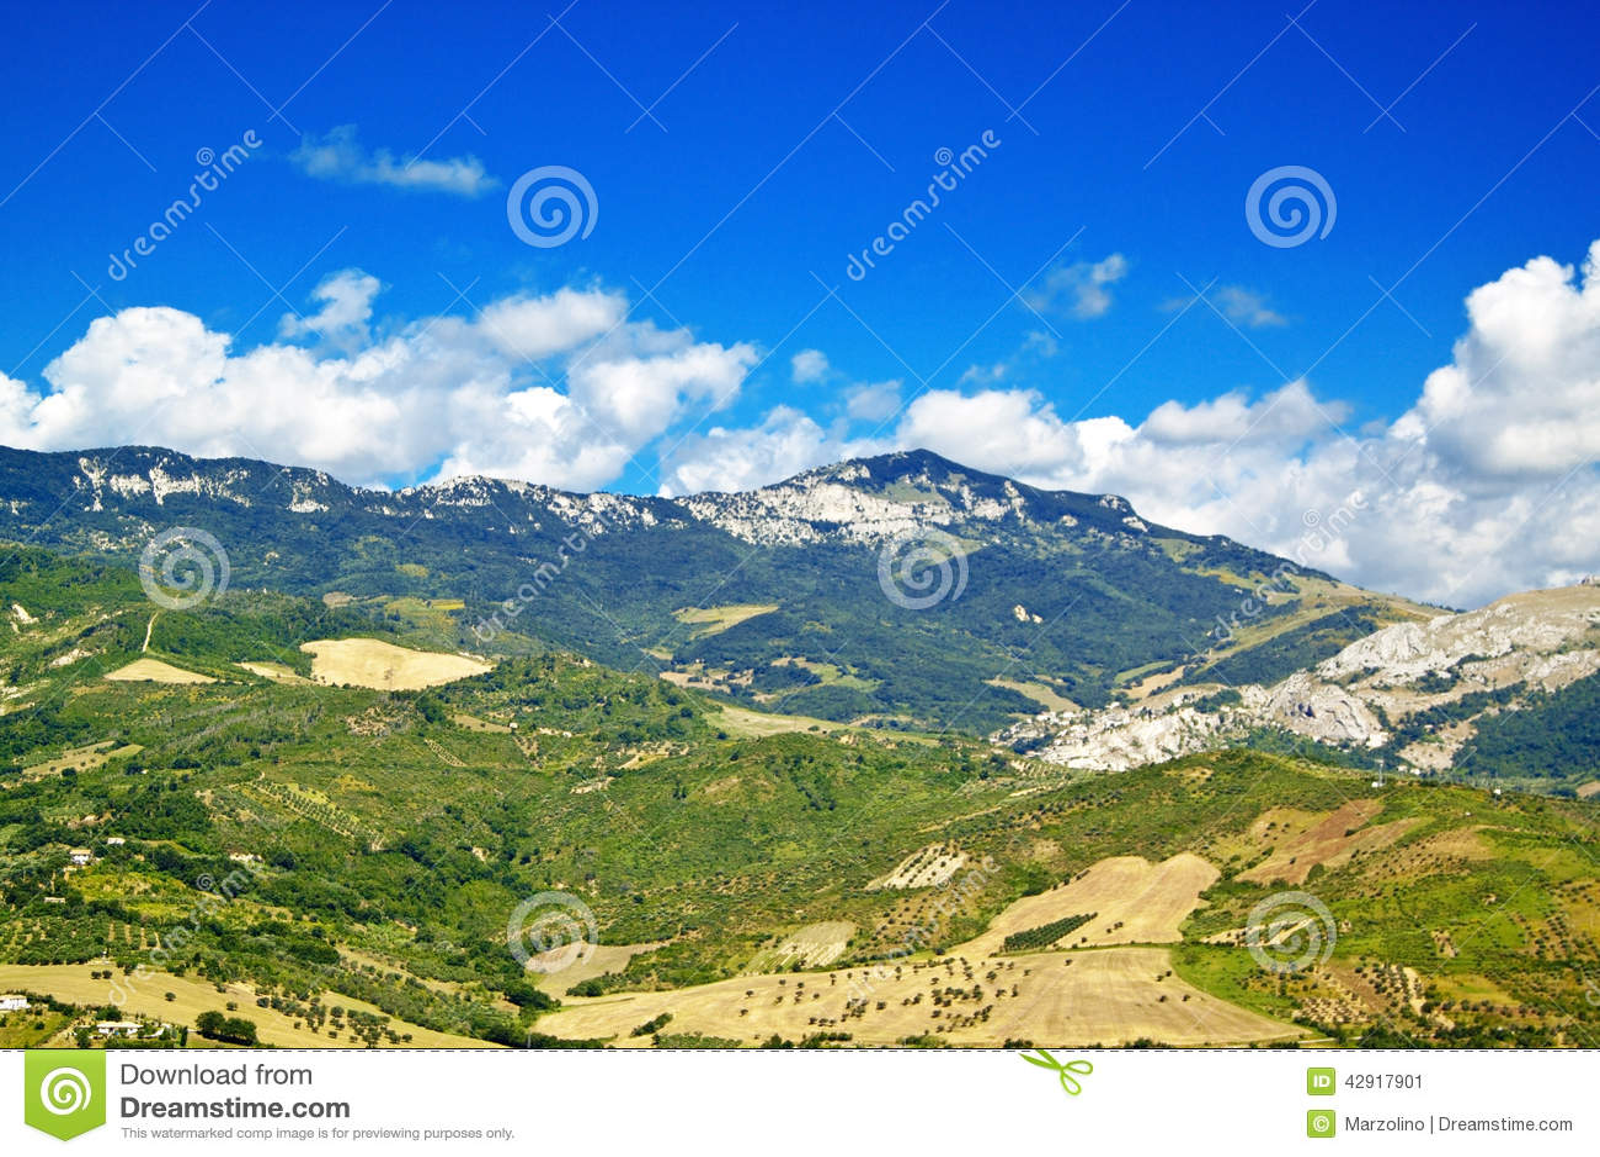 Abruzzo Countryside Duodecies Stock Photo Image 42917901